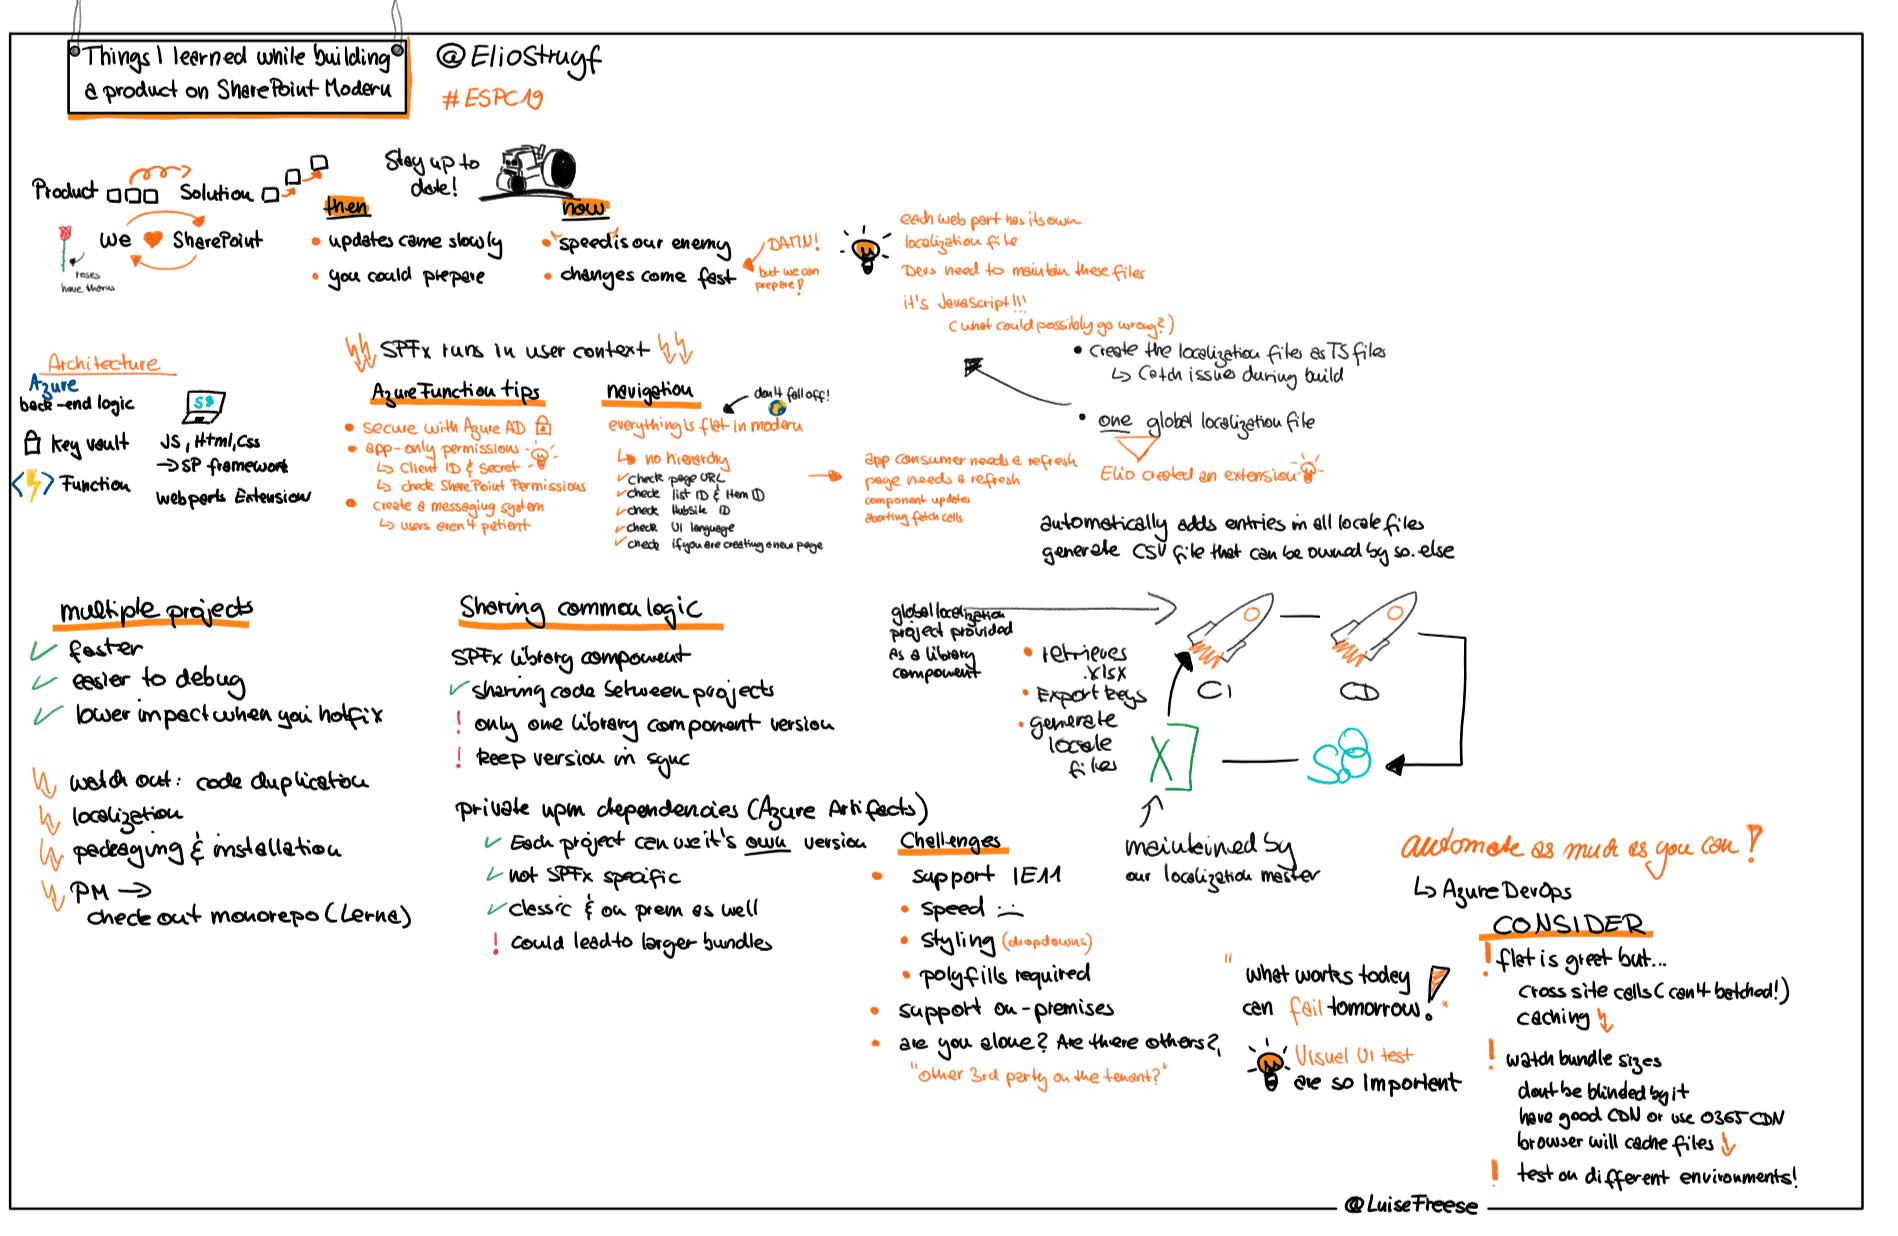 Summary of my session at ESPC 19